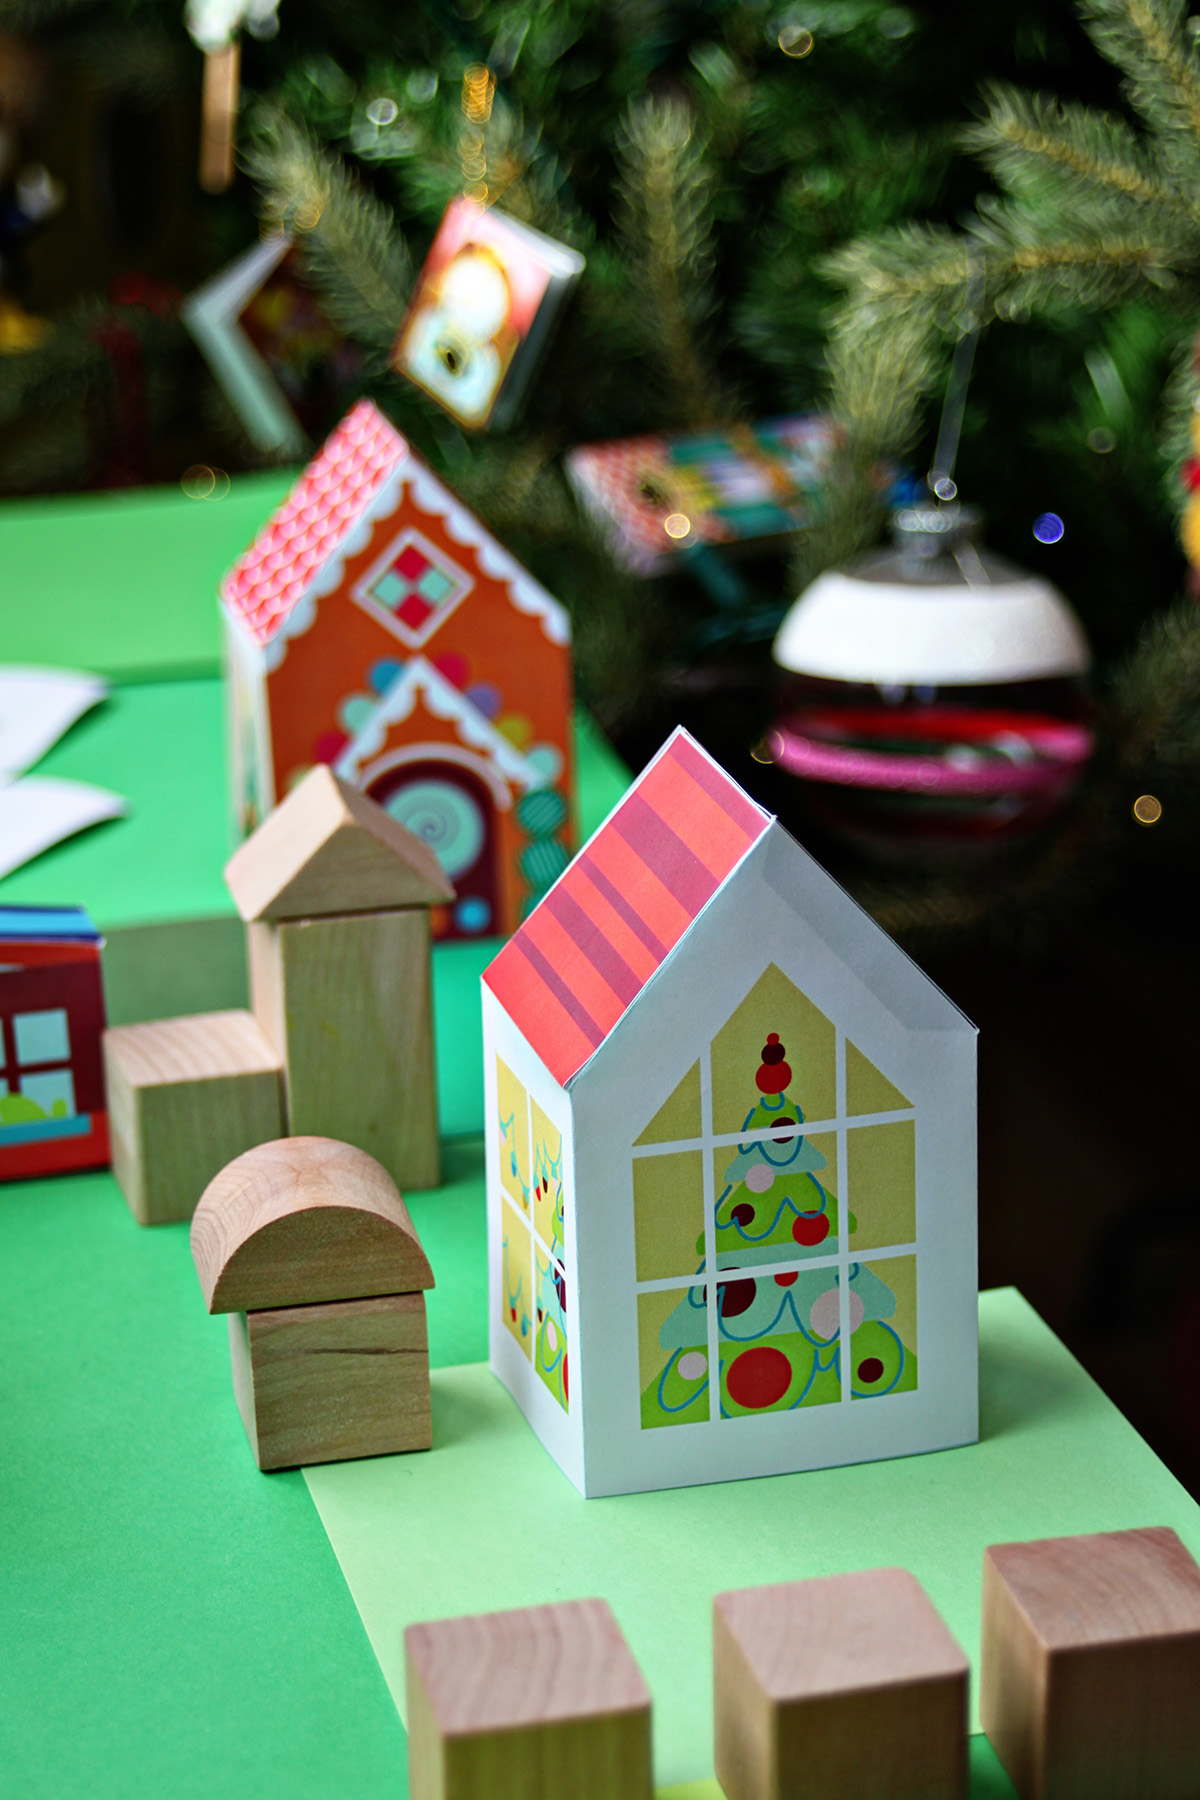 Build your own neighborhood house 4 the neighborhood for Build your own 3d house